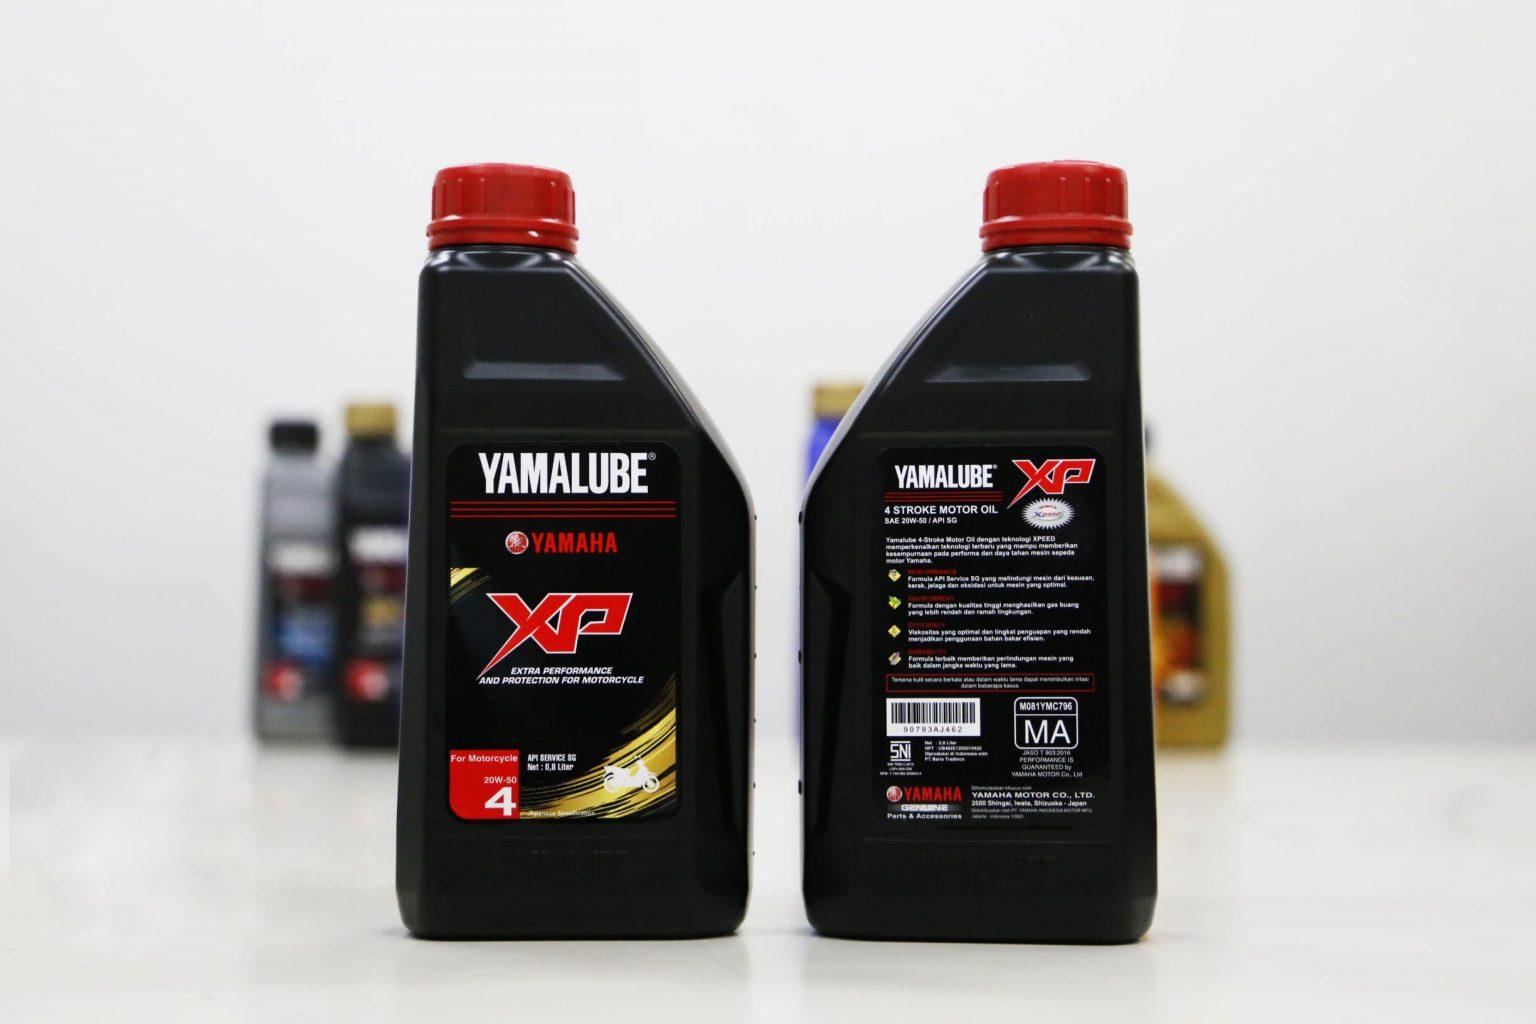 Yamaha Indonesia resmi merilis Yamalube XP-50 untuk motor Yamaha produksi 2010 ke bawah